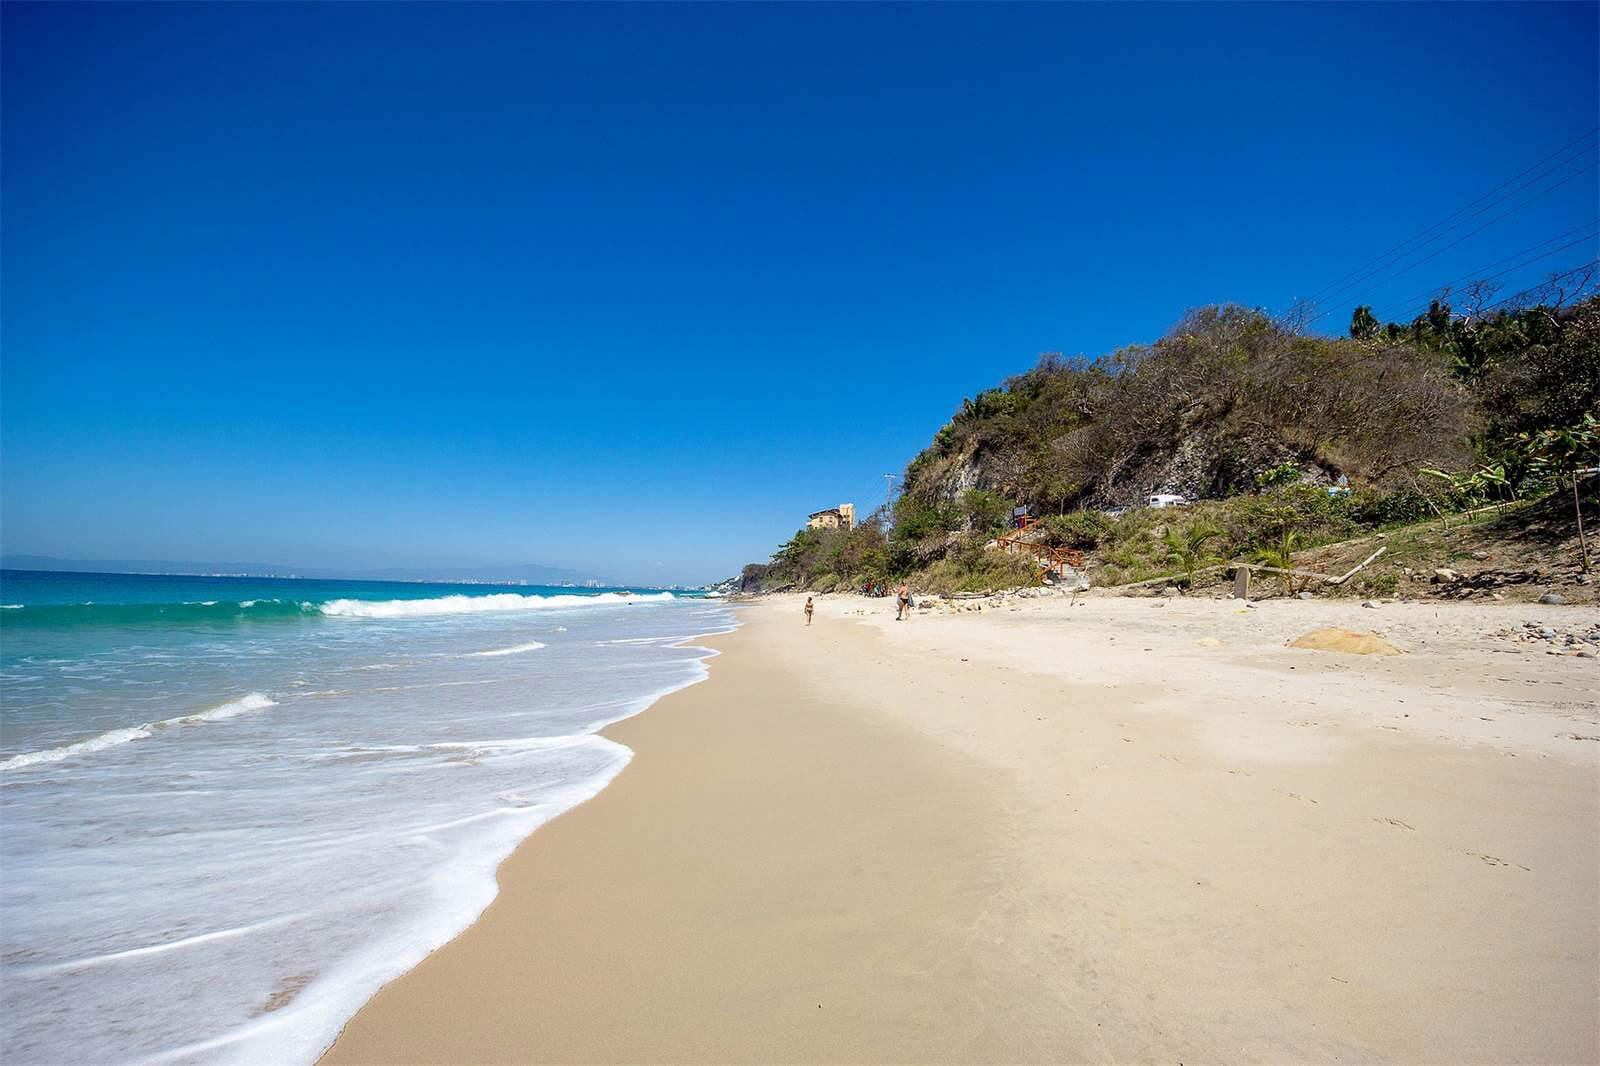 Lote Punta Negra, Waterfront land in Puerto Vallarta |Guadalajara Sotheby's International Realty |Finest Residences